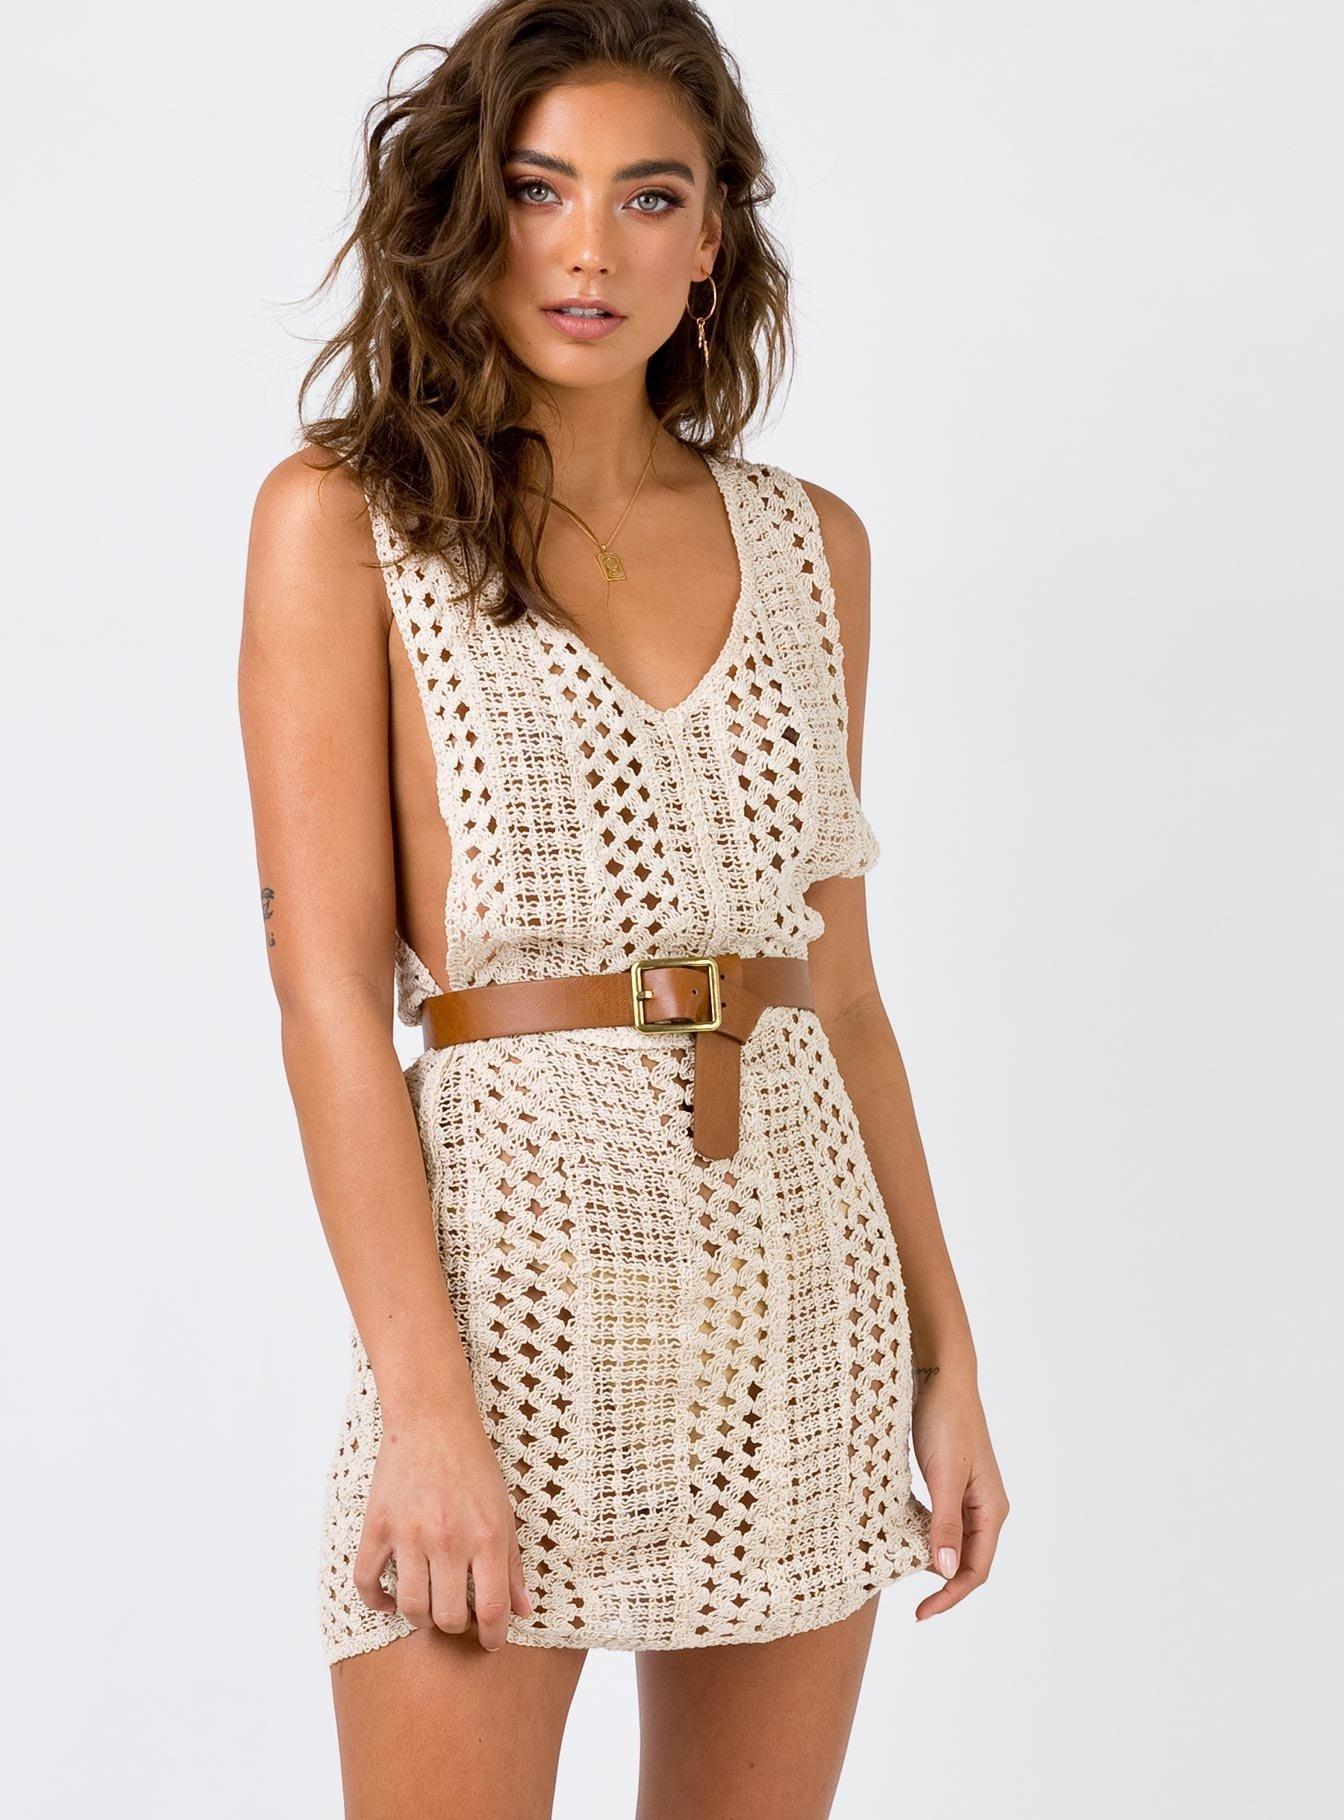 Vestidos de crochê 2021